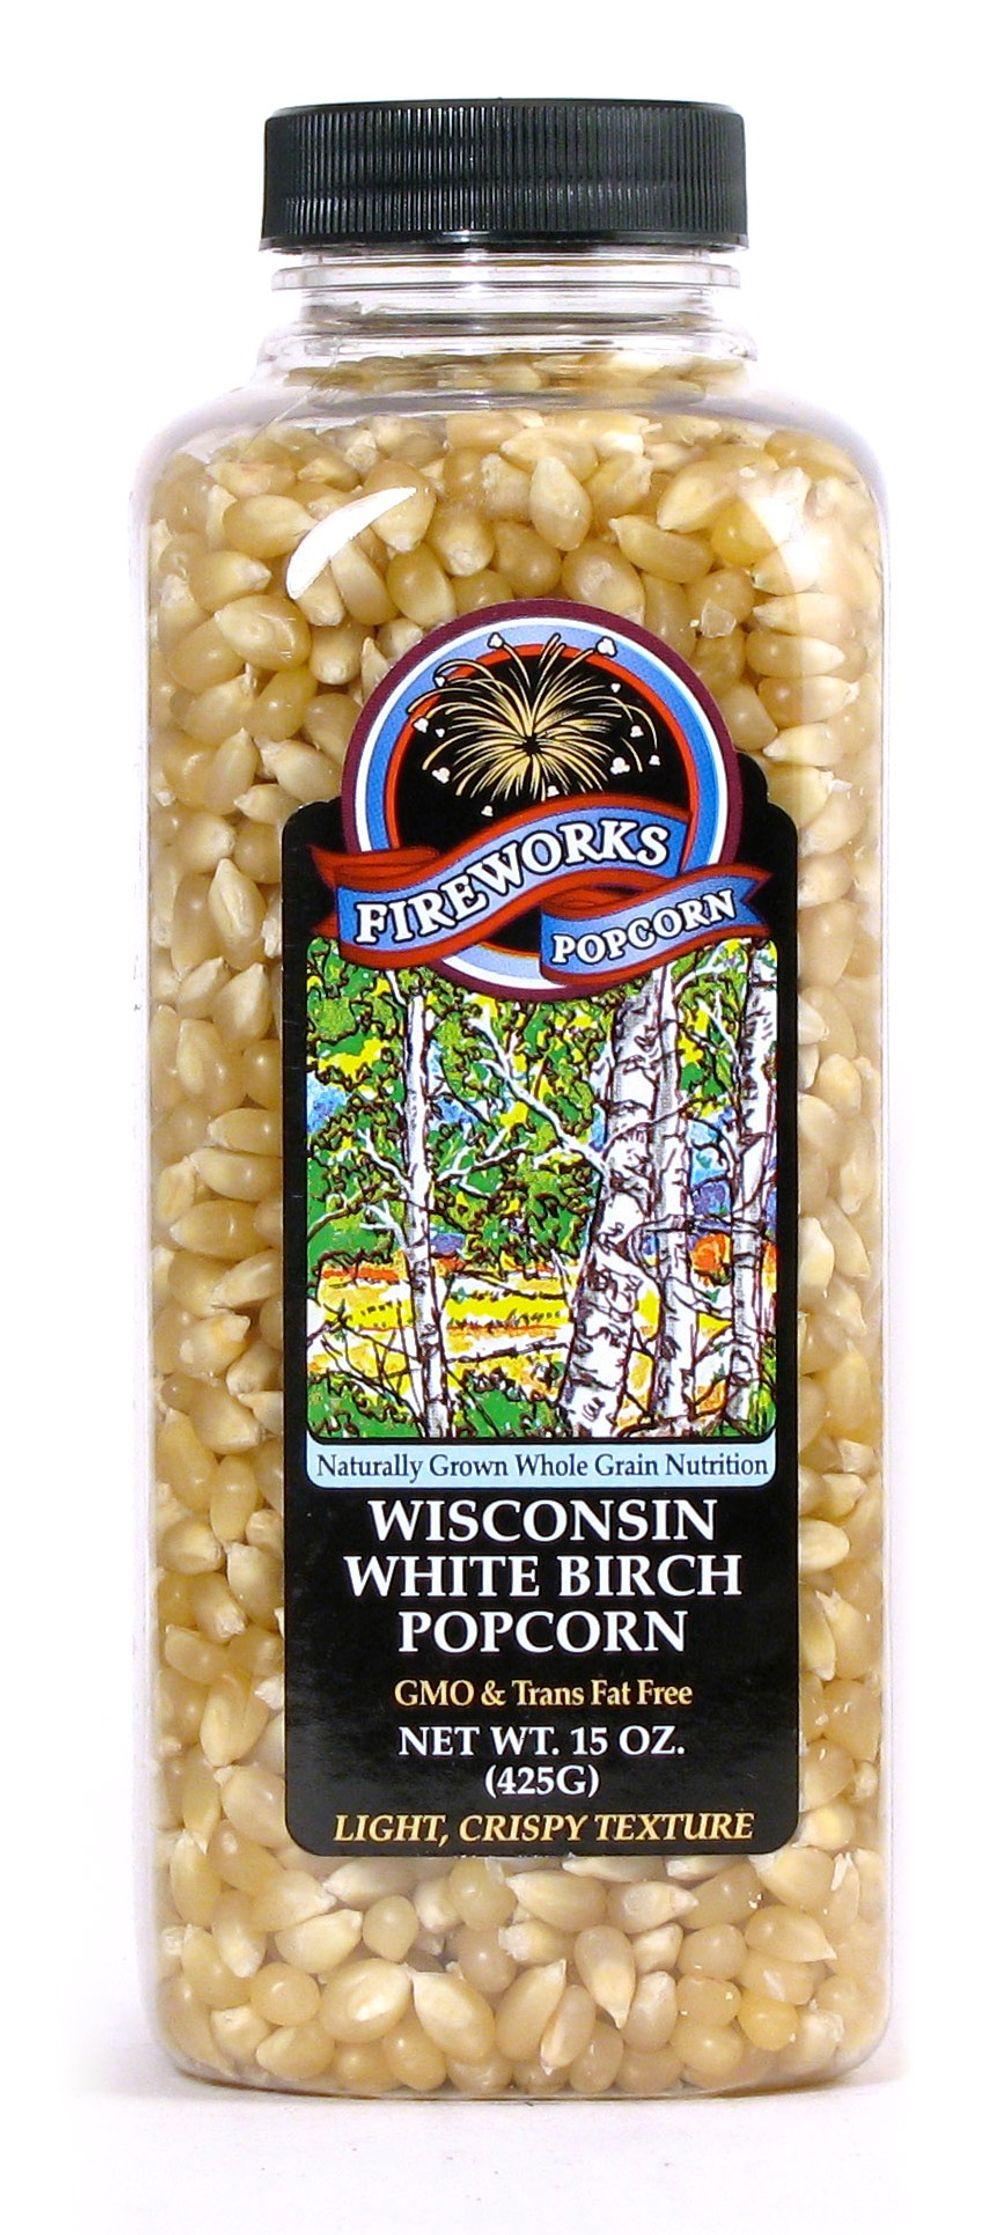 Wisconsin White